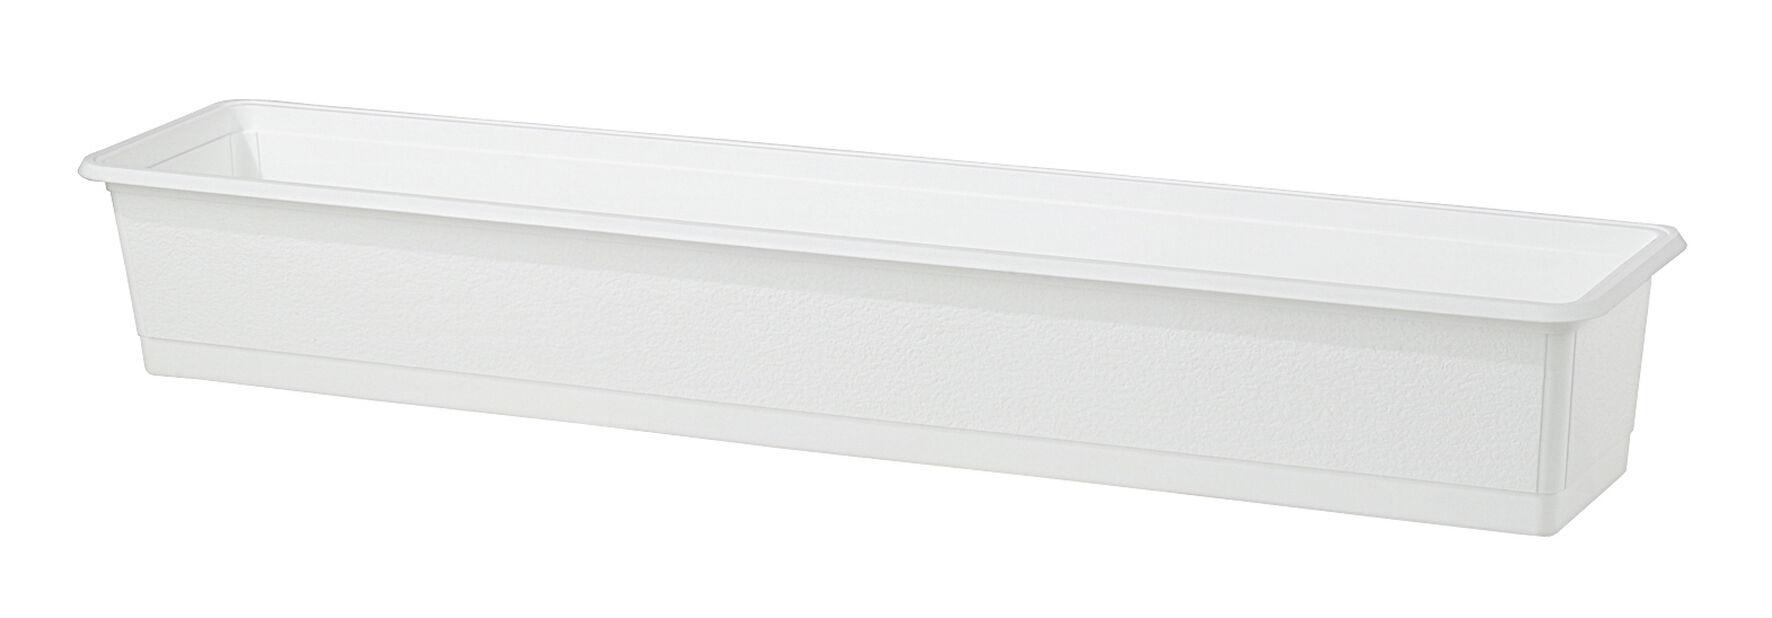 Balkonglåda Structure 90 cm vit